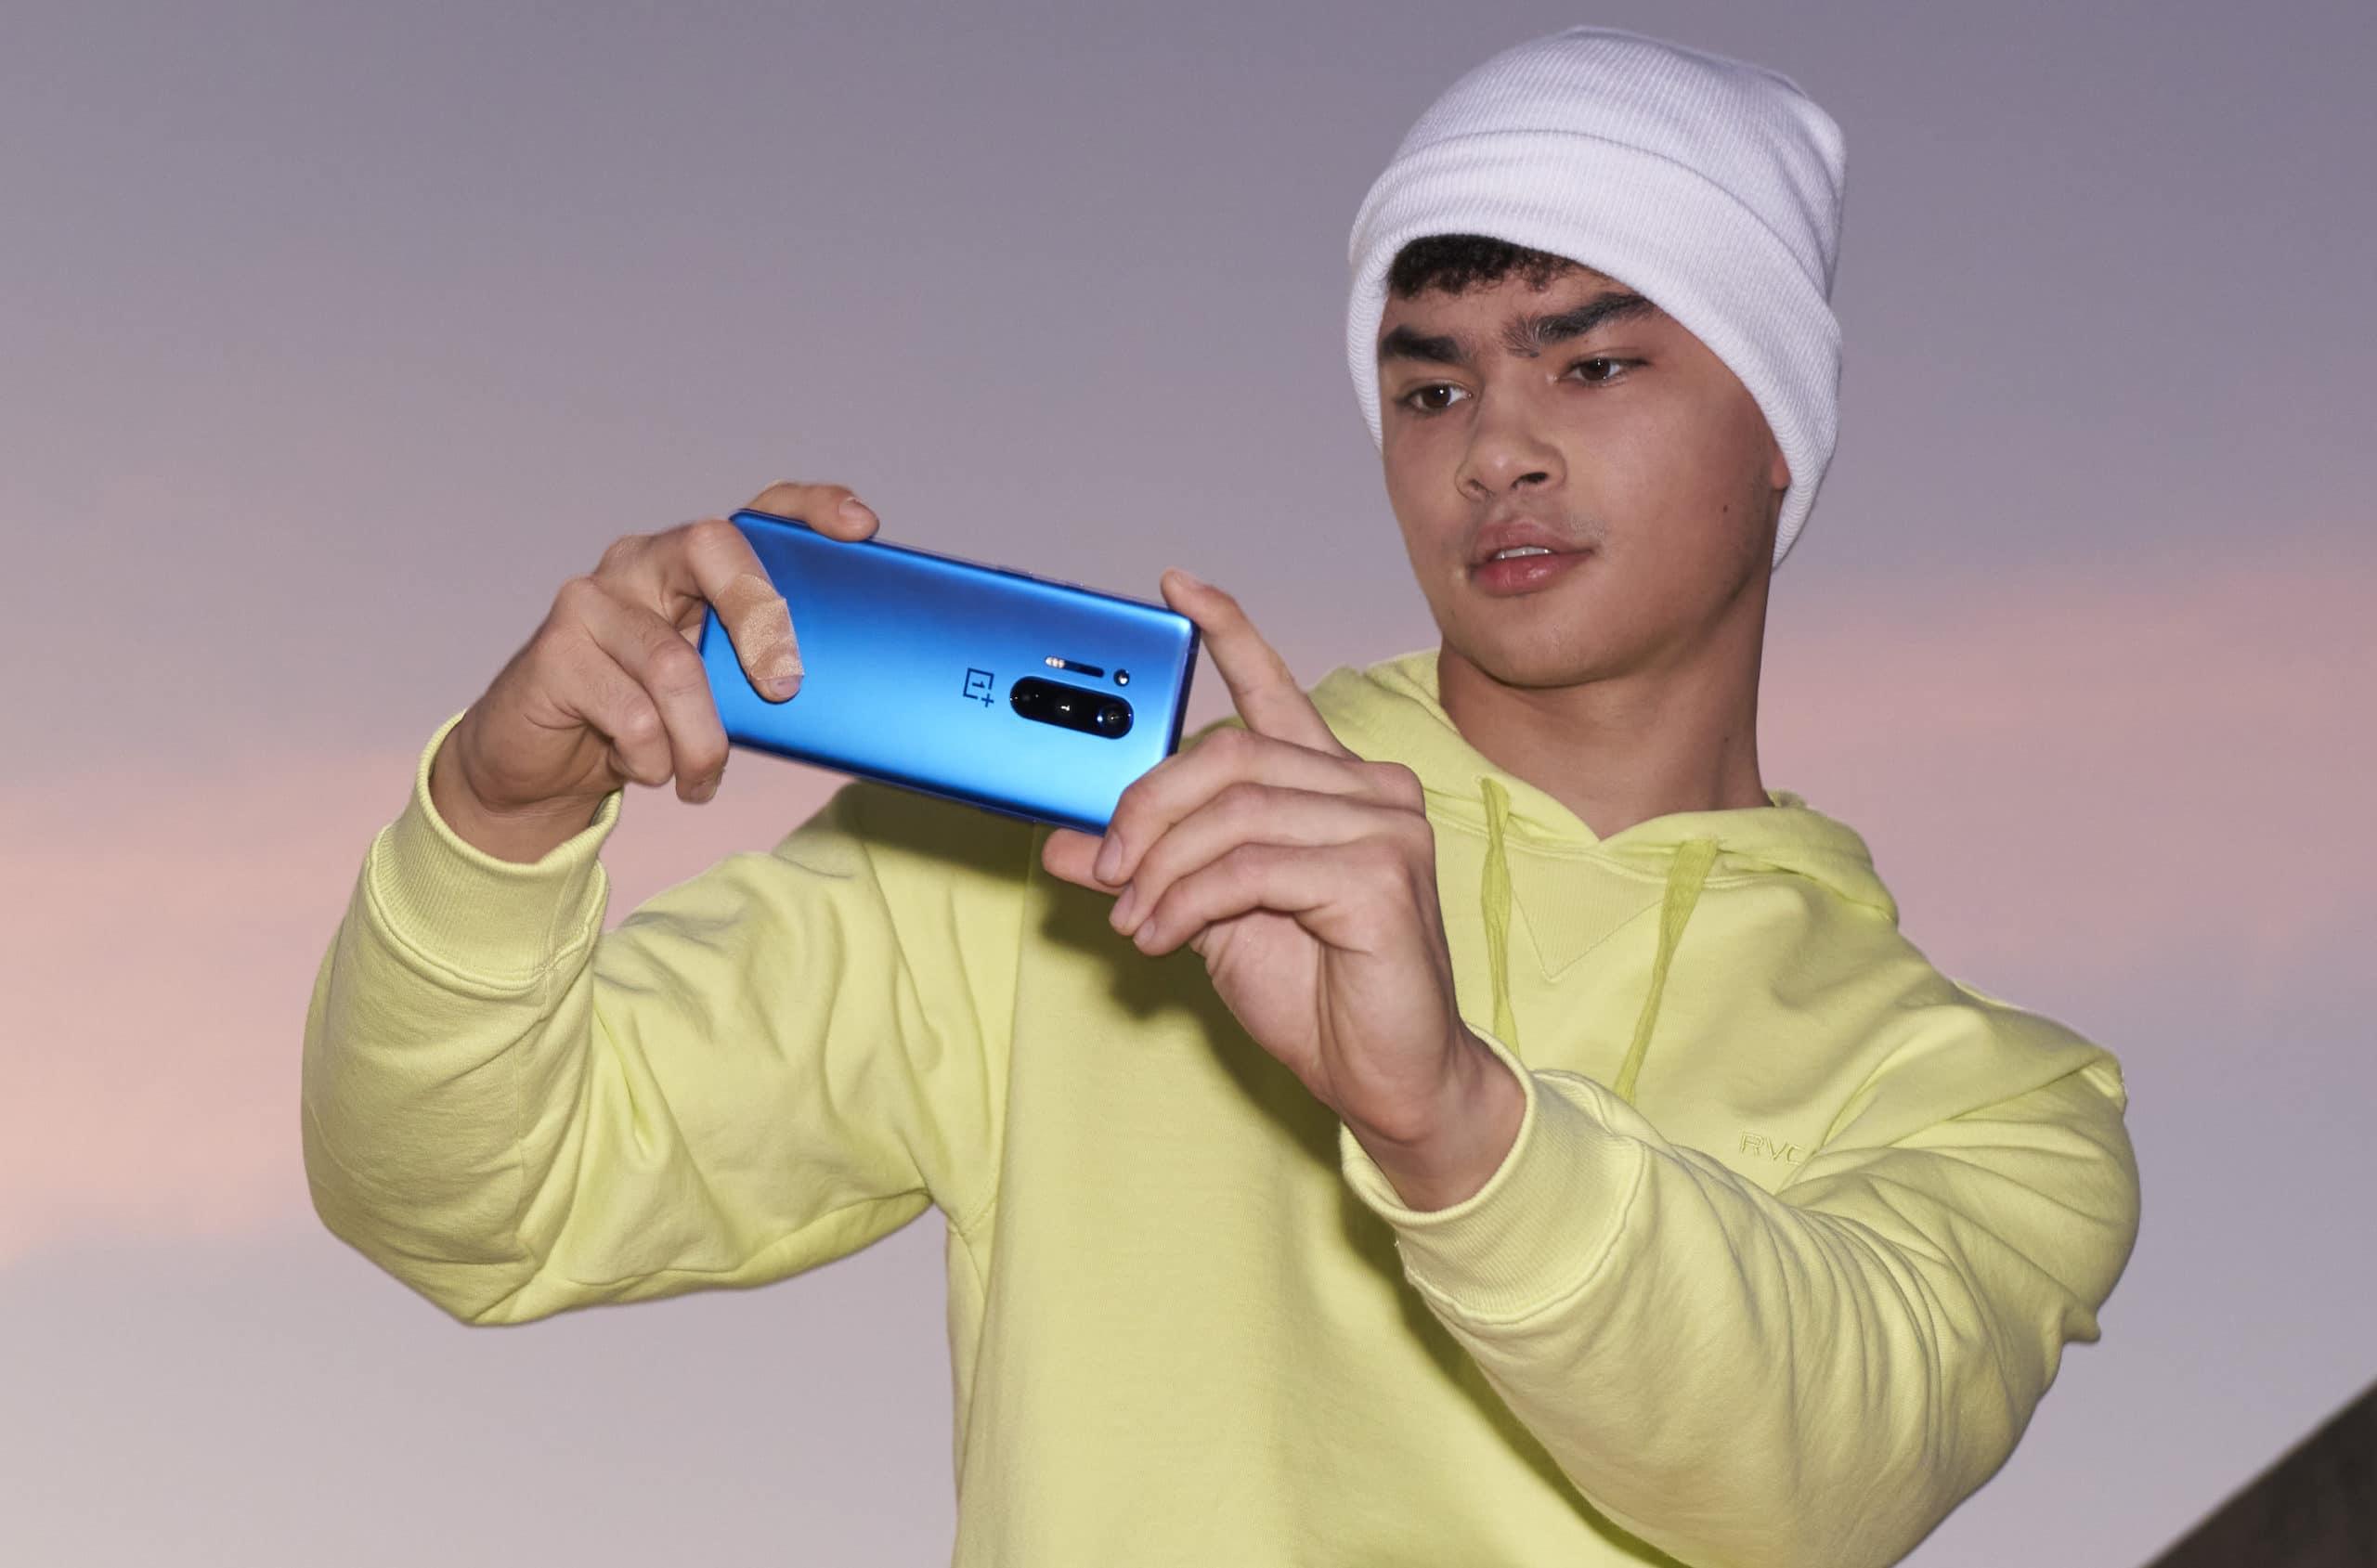 OnePlus 8 Pro in blue